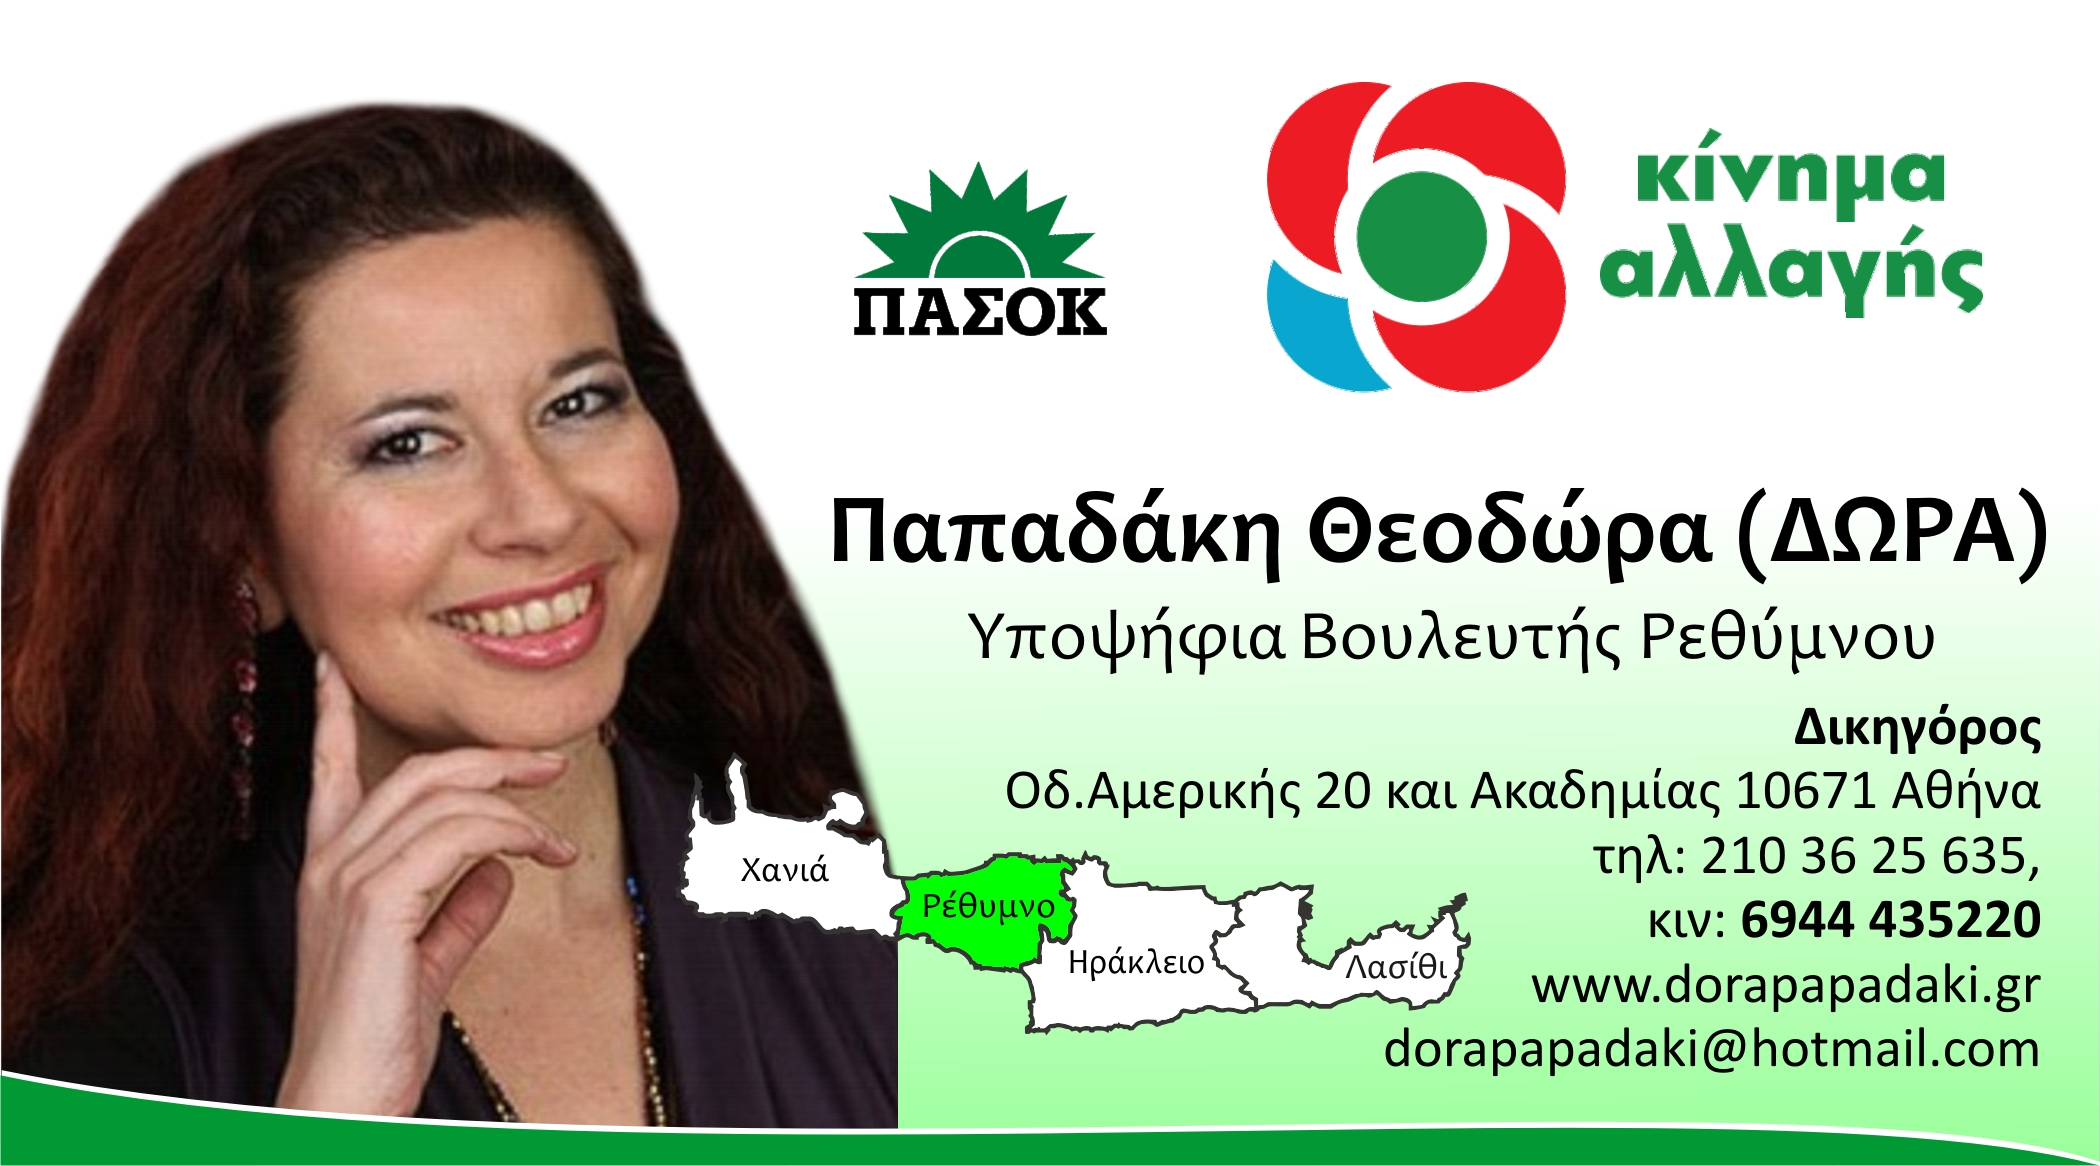 Dora-Papadki-1.